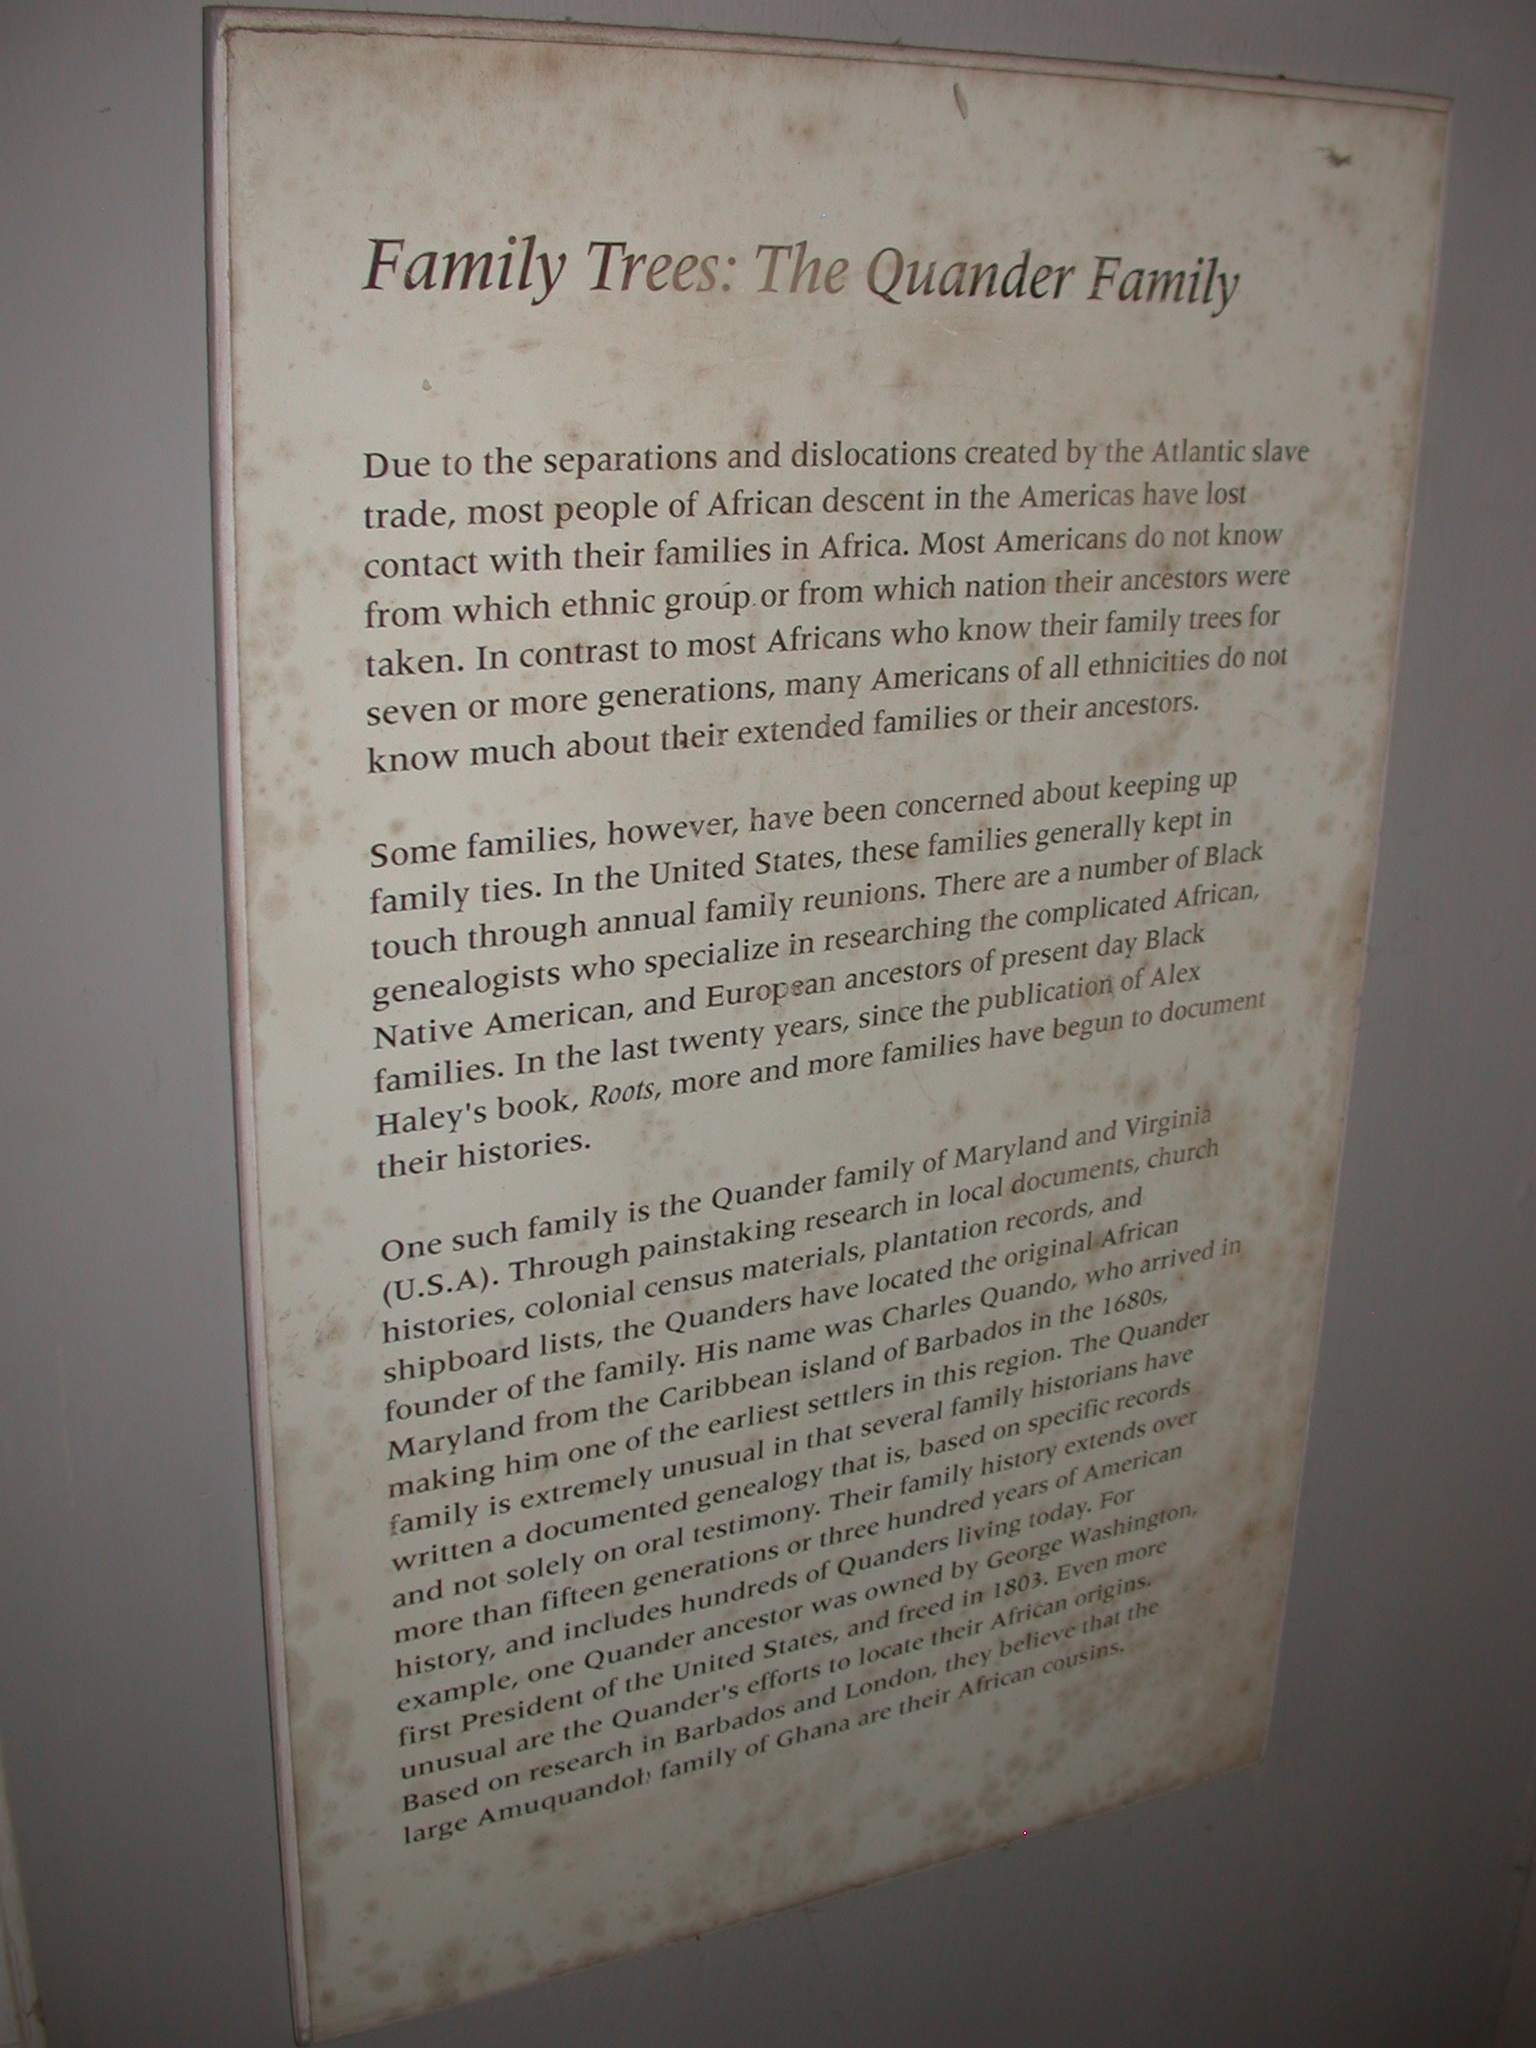 African Slave Family Tree Description, Cape Coast Slave Fort Museum, Cape Coast, Ghana